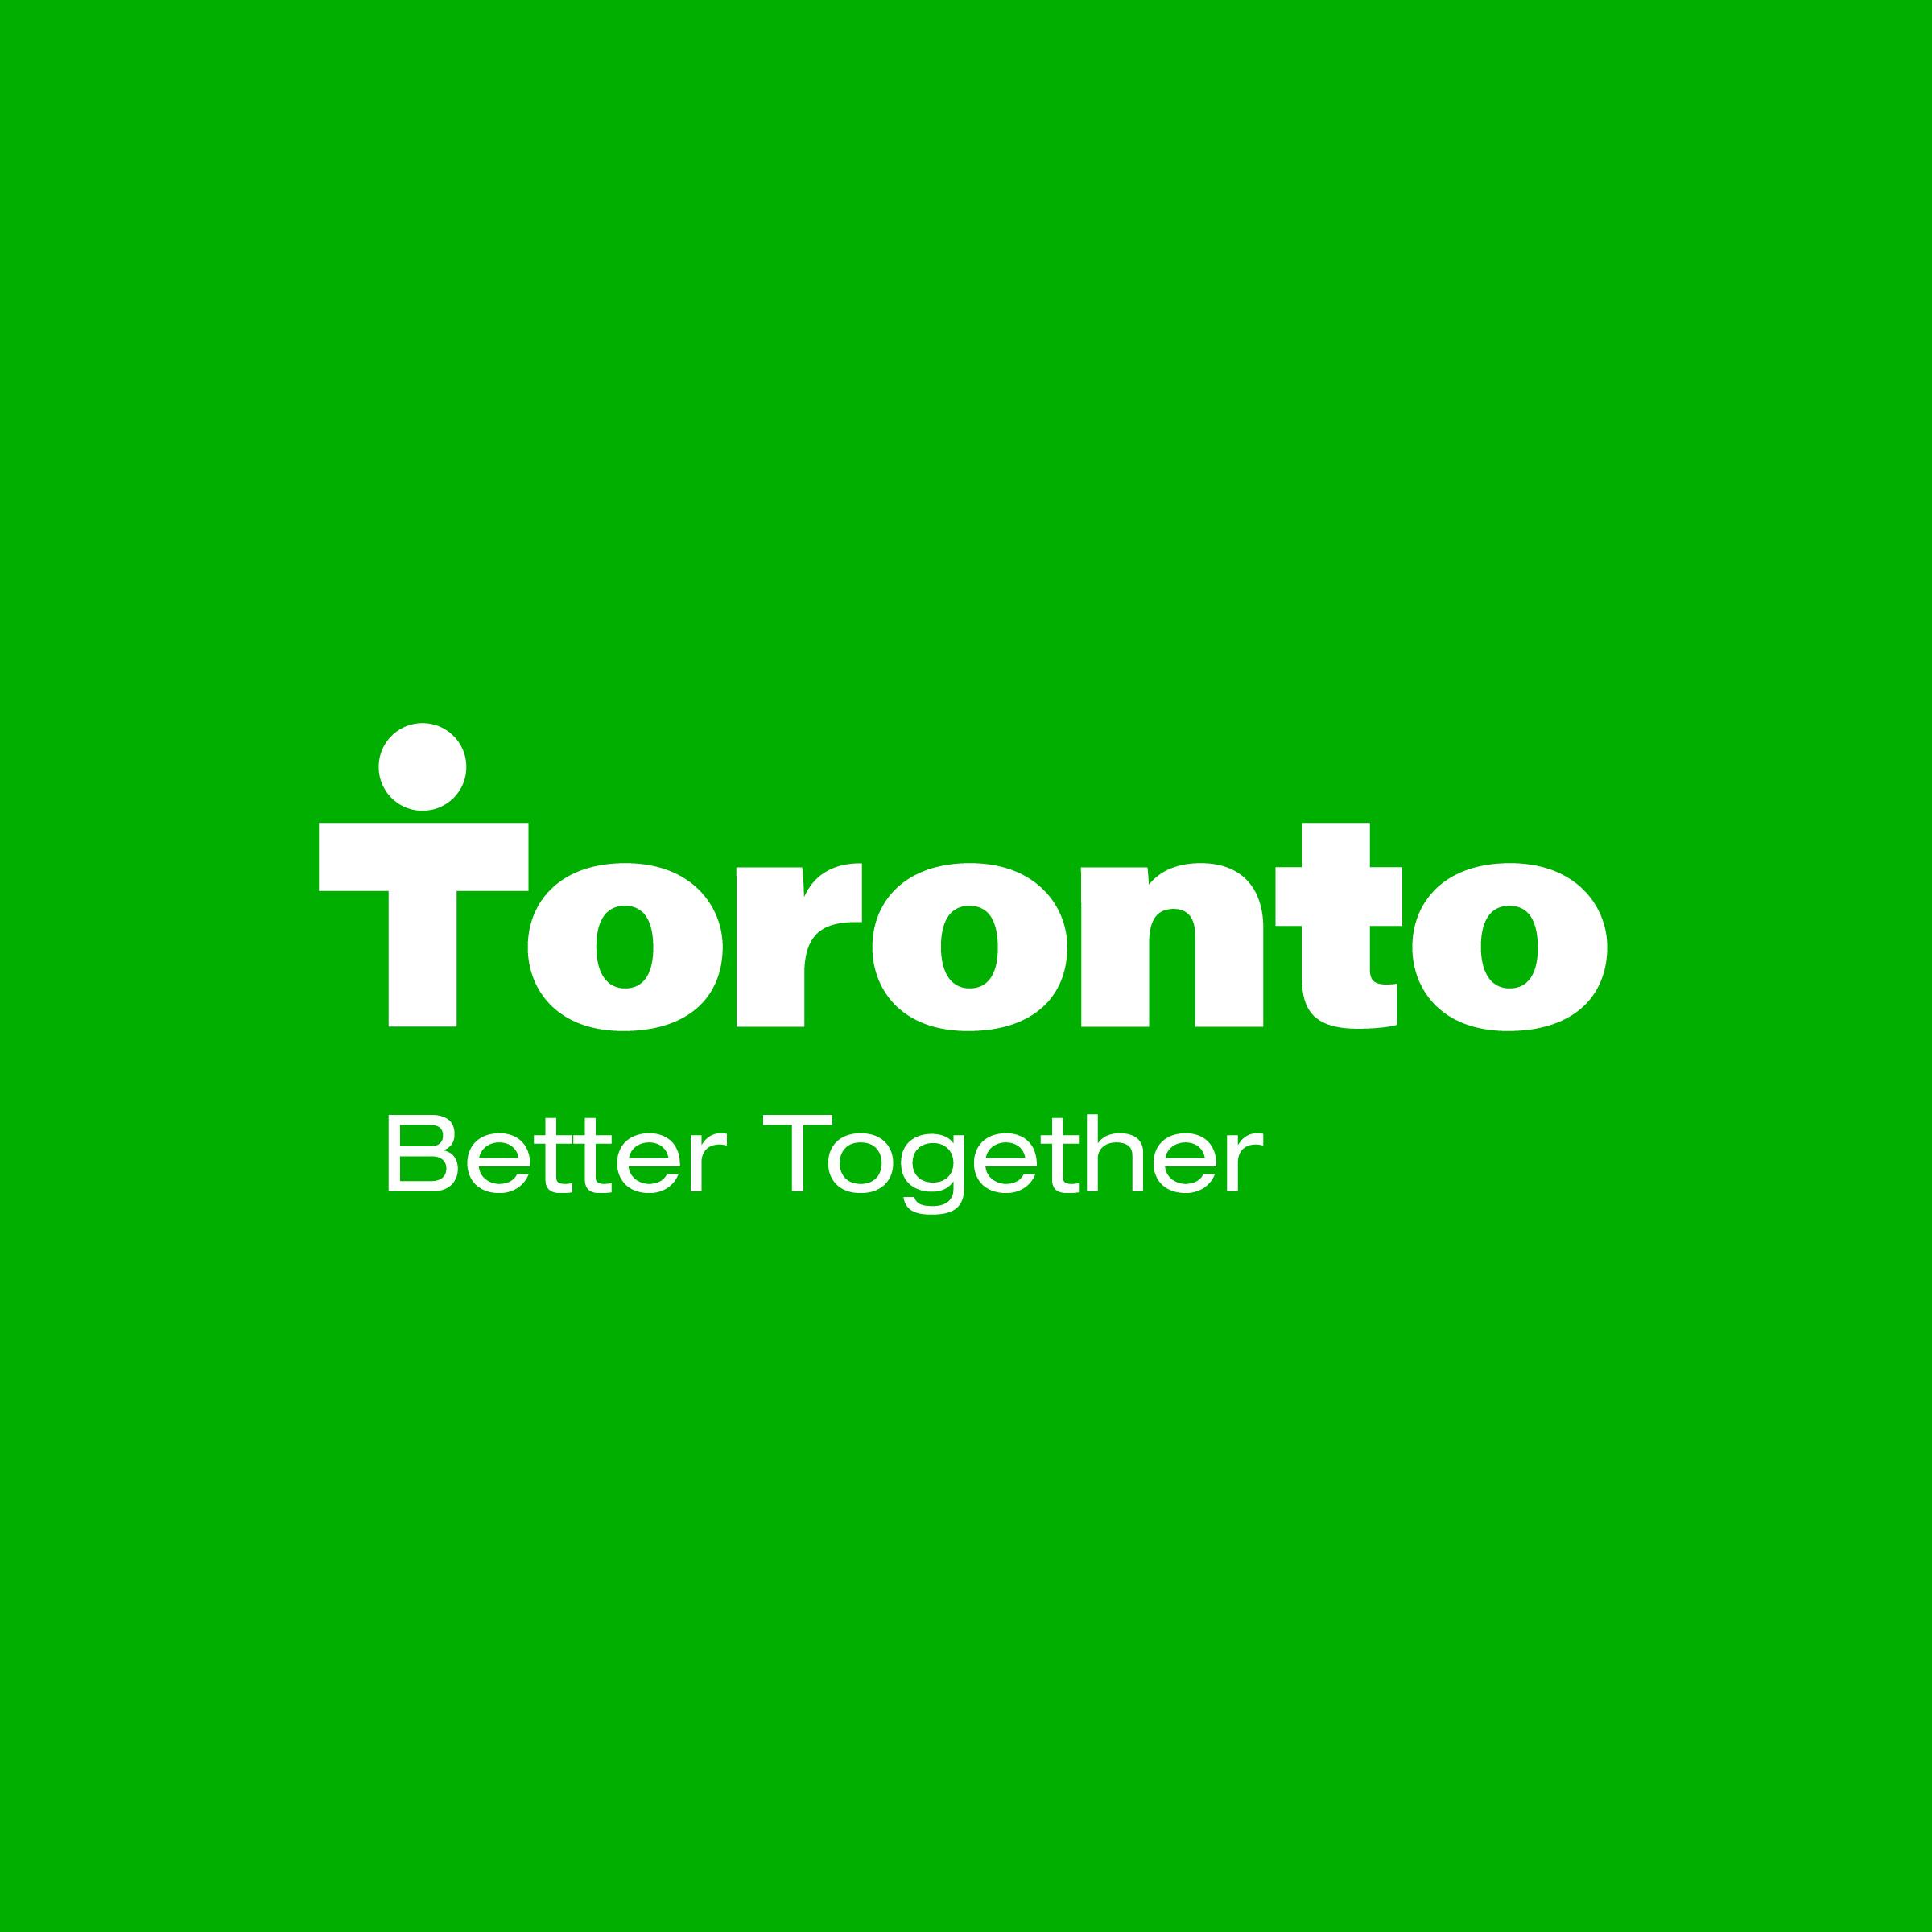 Toronto_BrandBook-08